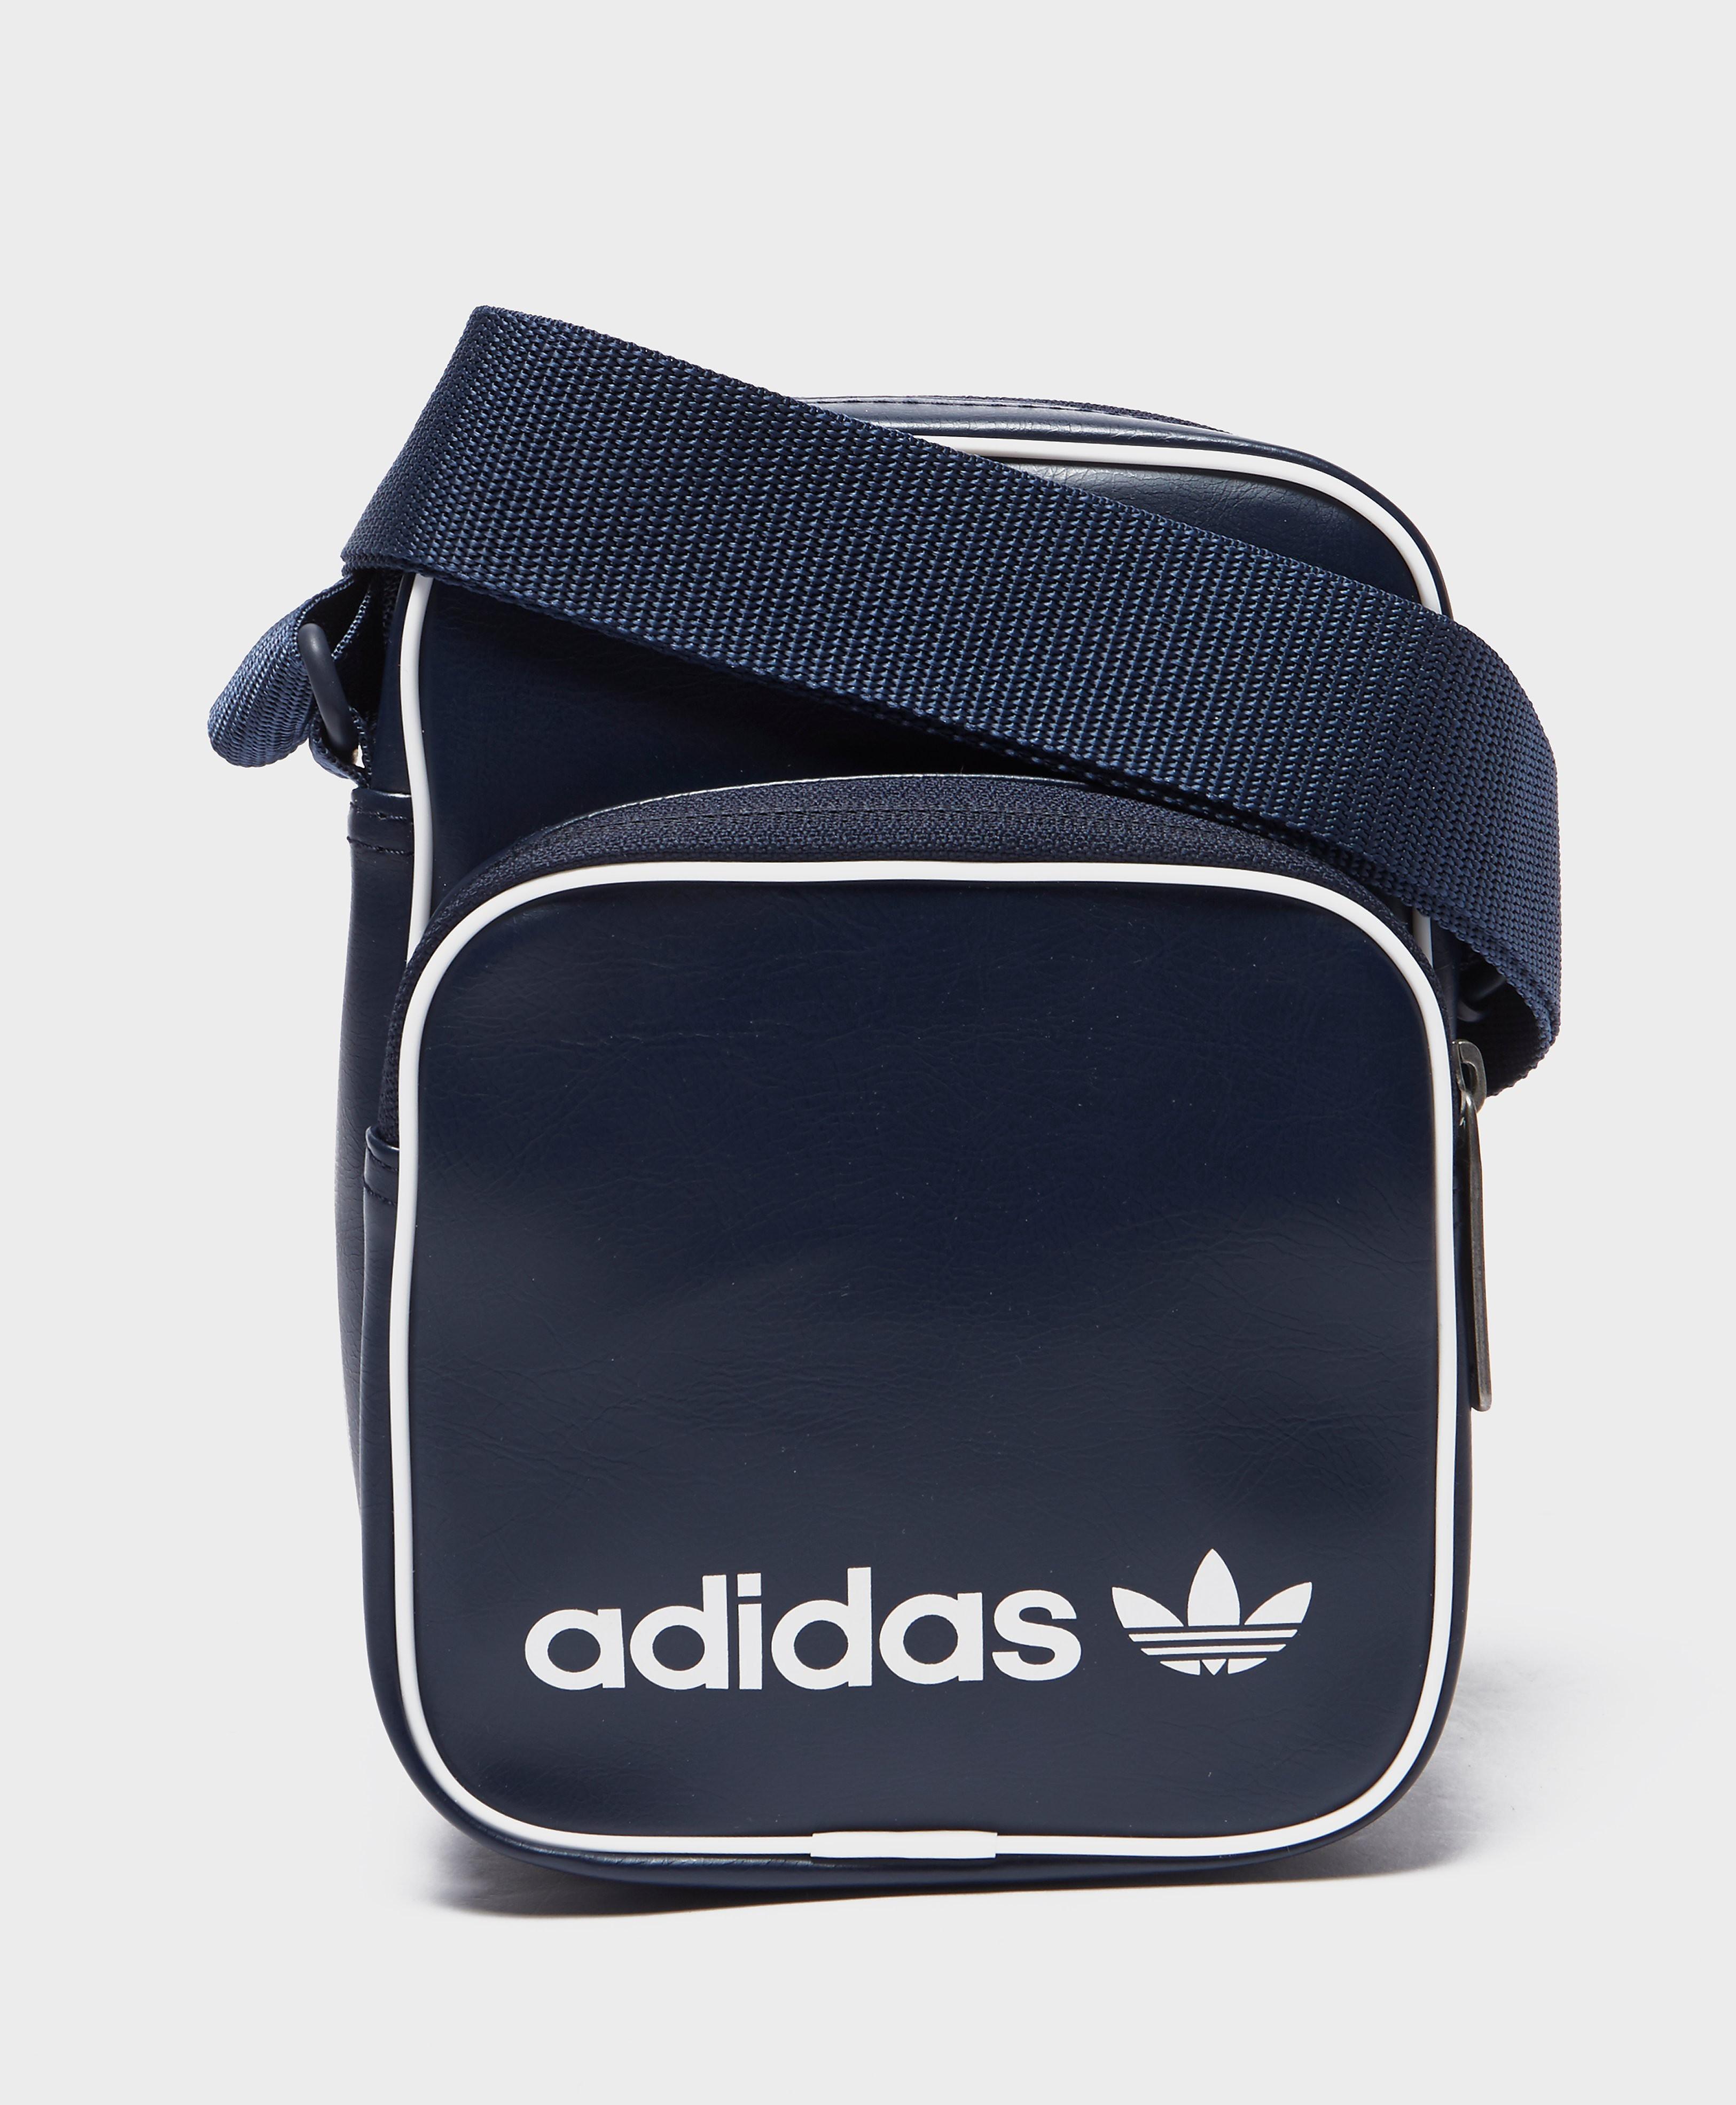 adidas Originals Mini Bag Vintage